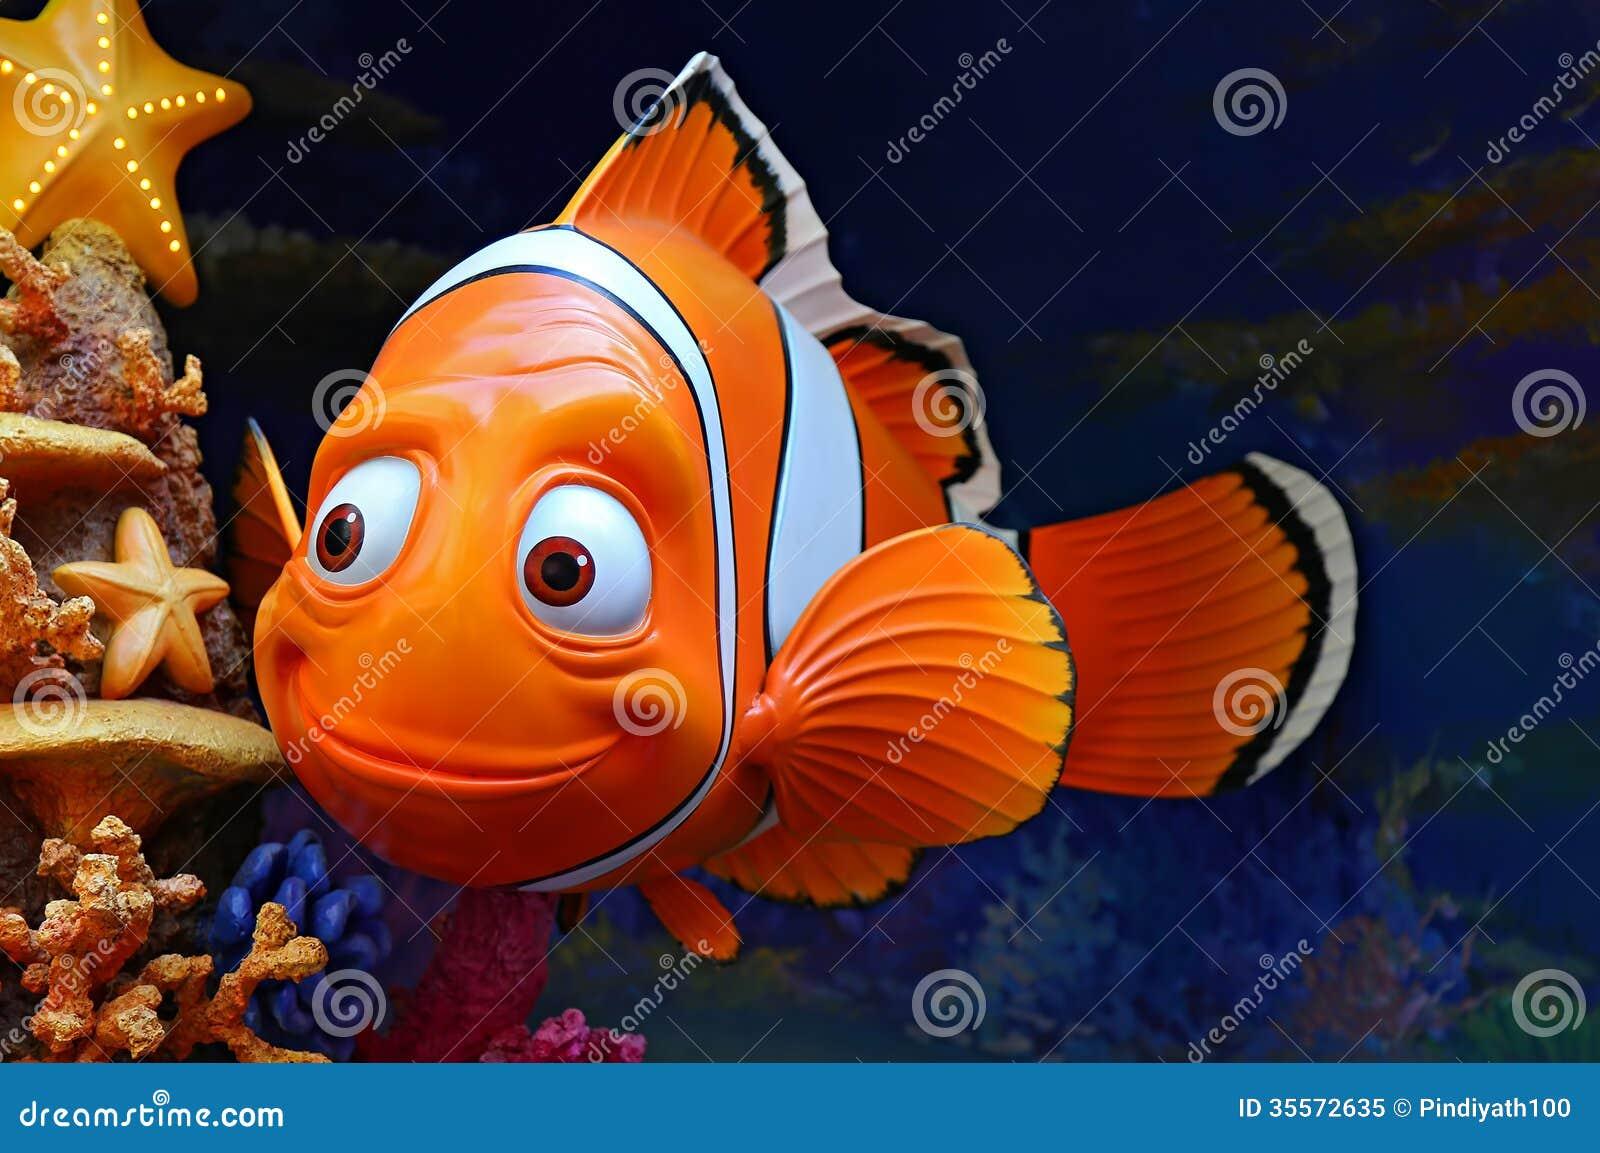 Disney Pixar Finding Nemo Character Editorial Image - Image: 35572635